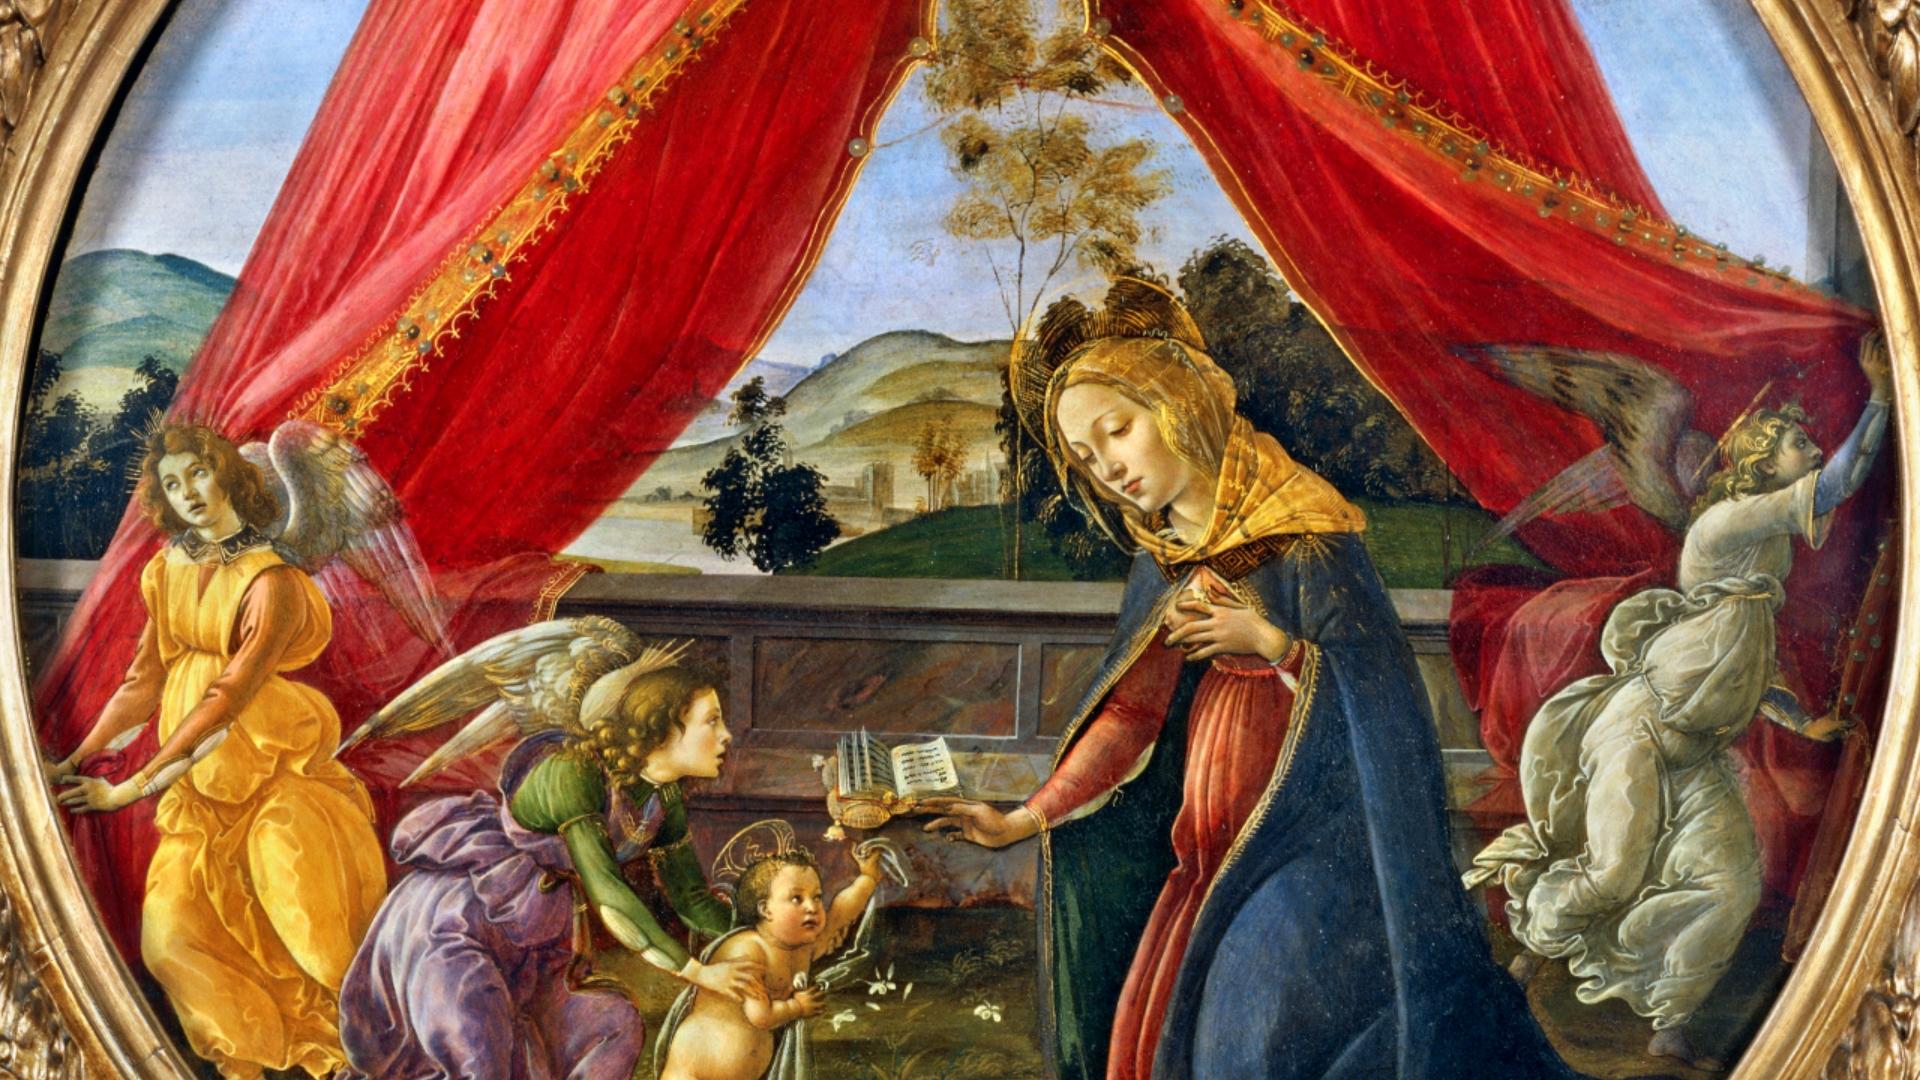 <p>Sandro Botticelli<br /> <em>Madonna del Padiglione</em>, dettaglio<br /> Tempera su tavola</p>